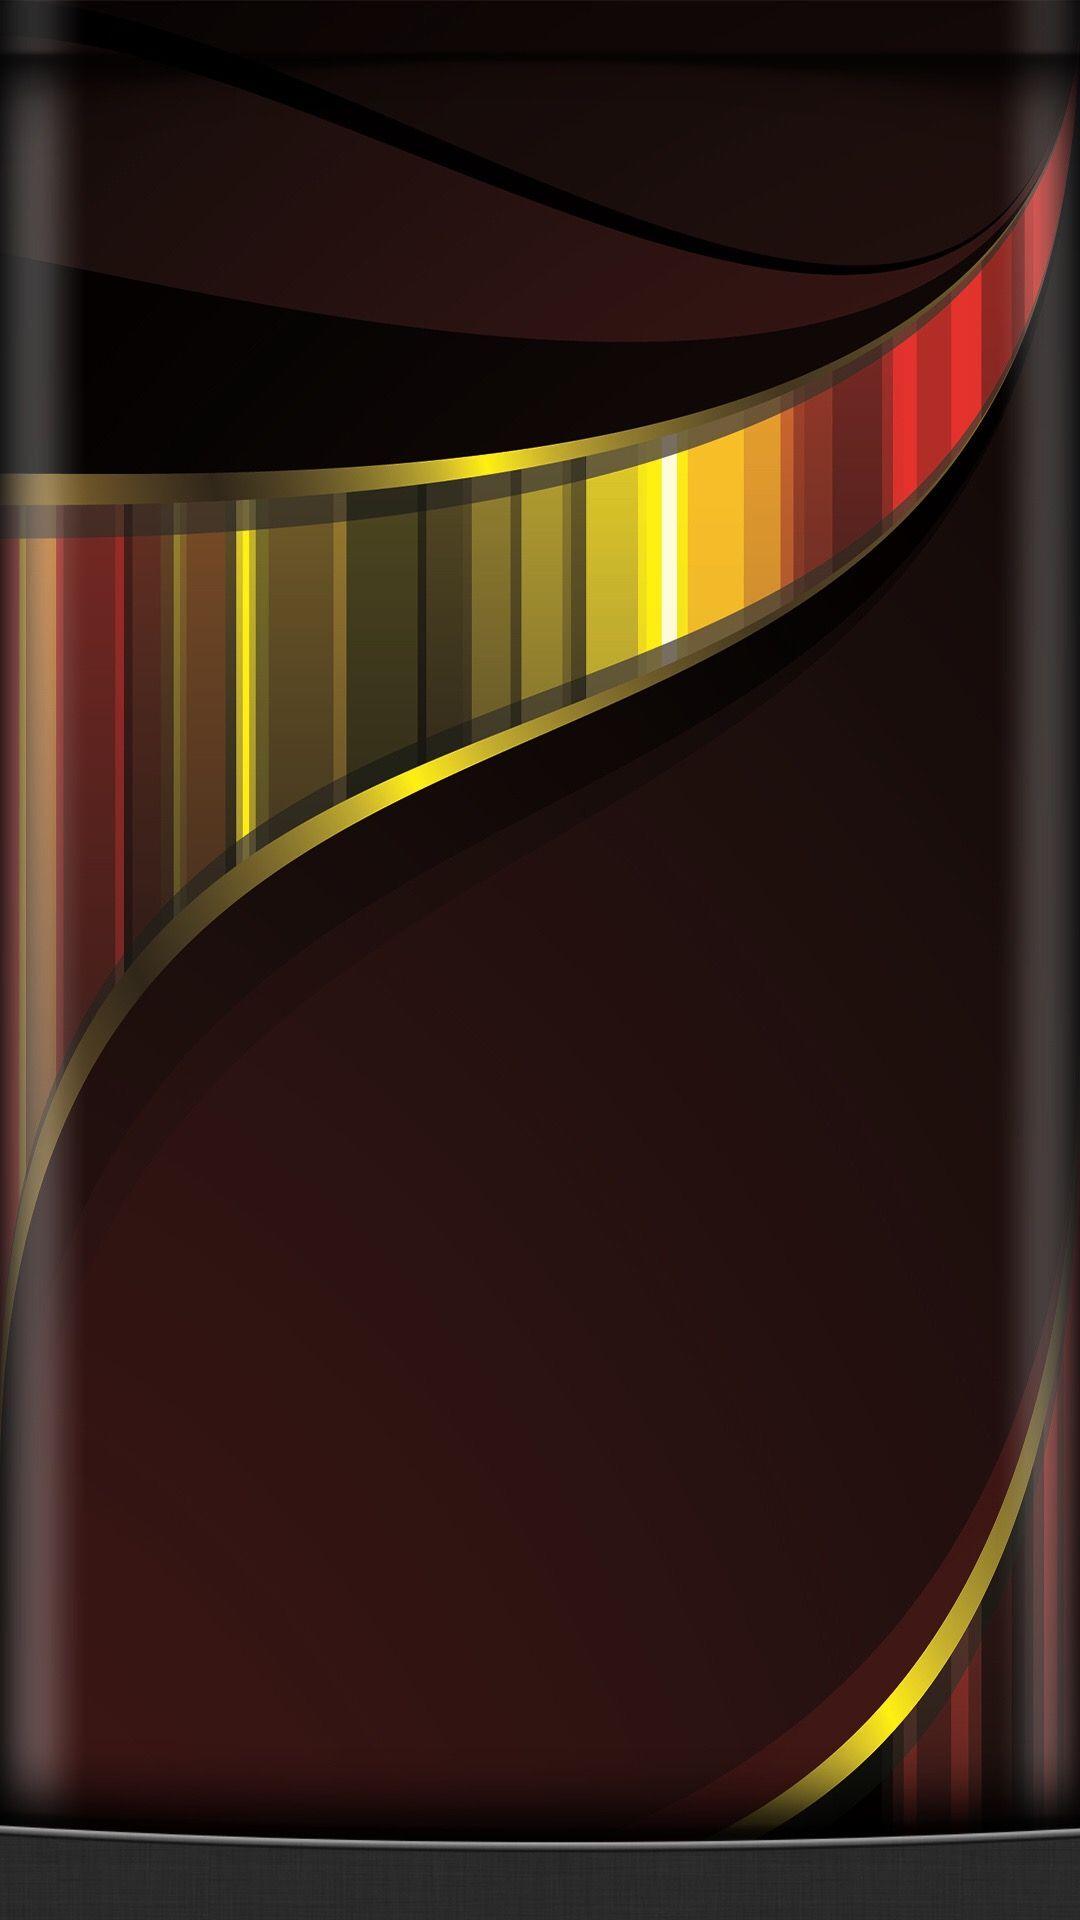 Samsung Iphone Edge Phone Telefon 3d Wallpaper Gold Wallpaper Download Wallpaper Hd Wallpaper